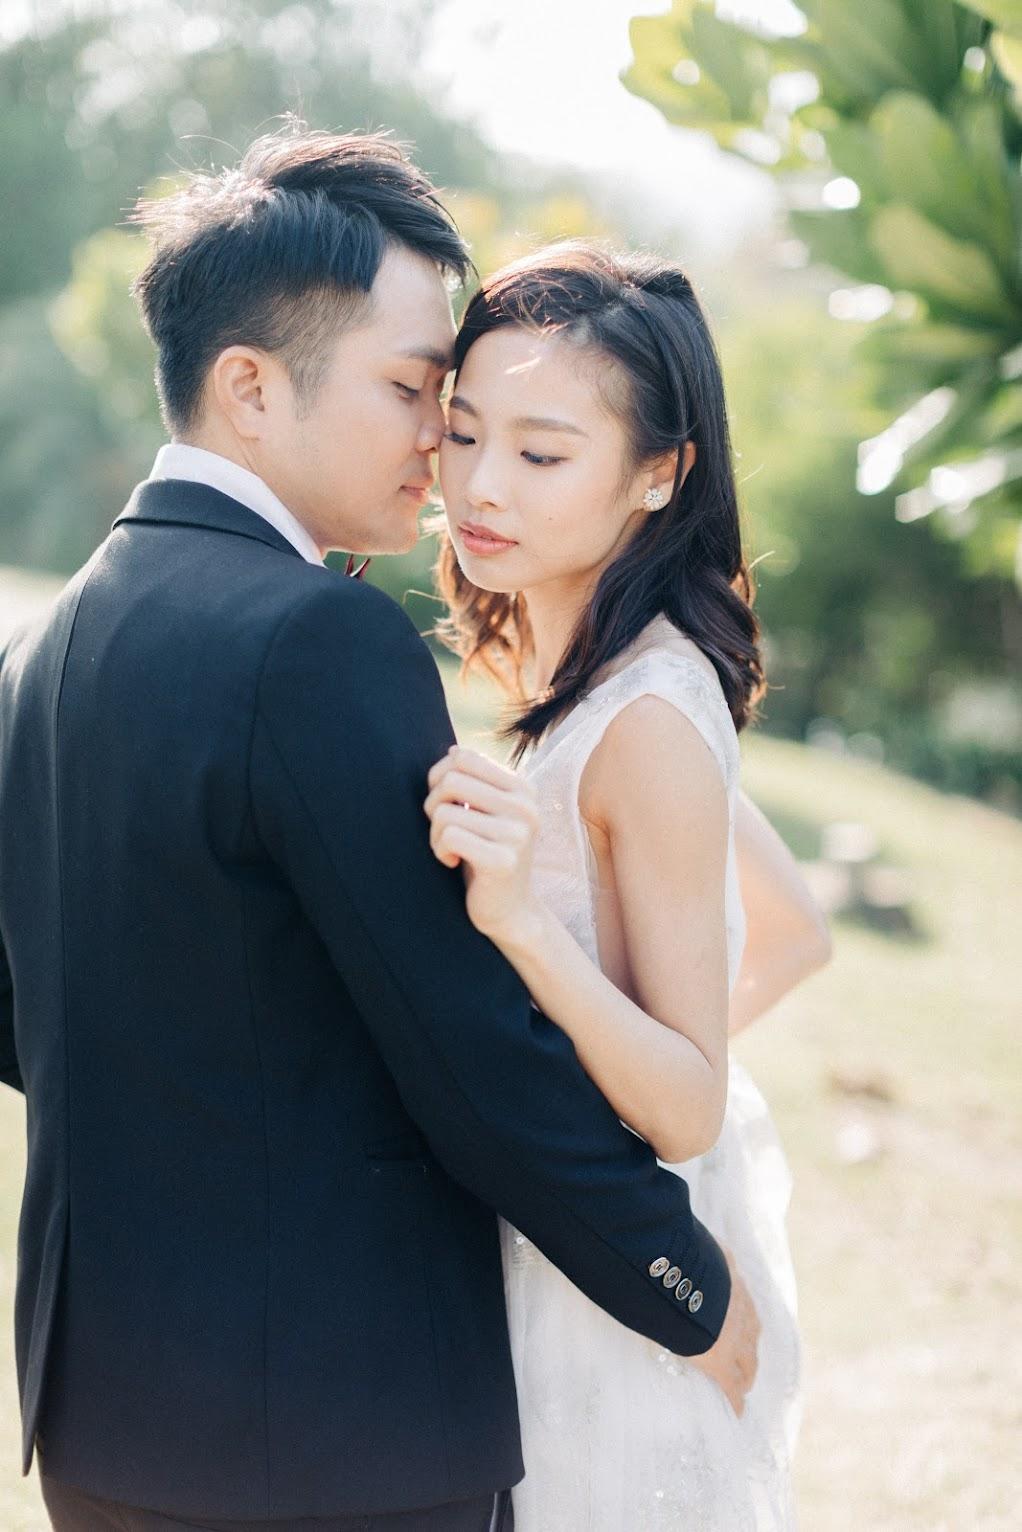 undefineda在 老新臺菜 舉行陽光正好的美式婚禮 ,是每位新娘夢寐以求的婚禮樣式!